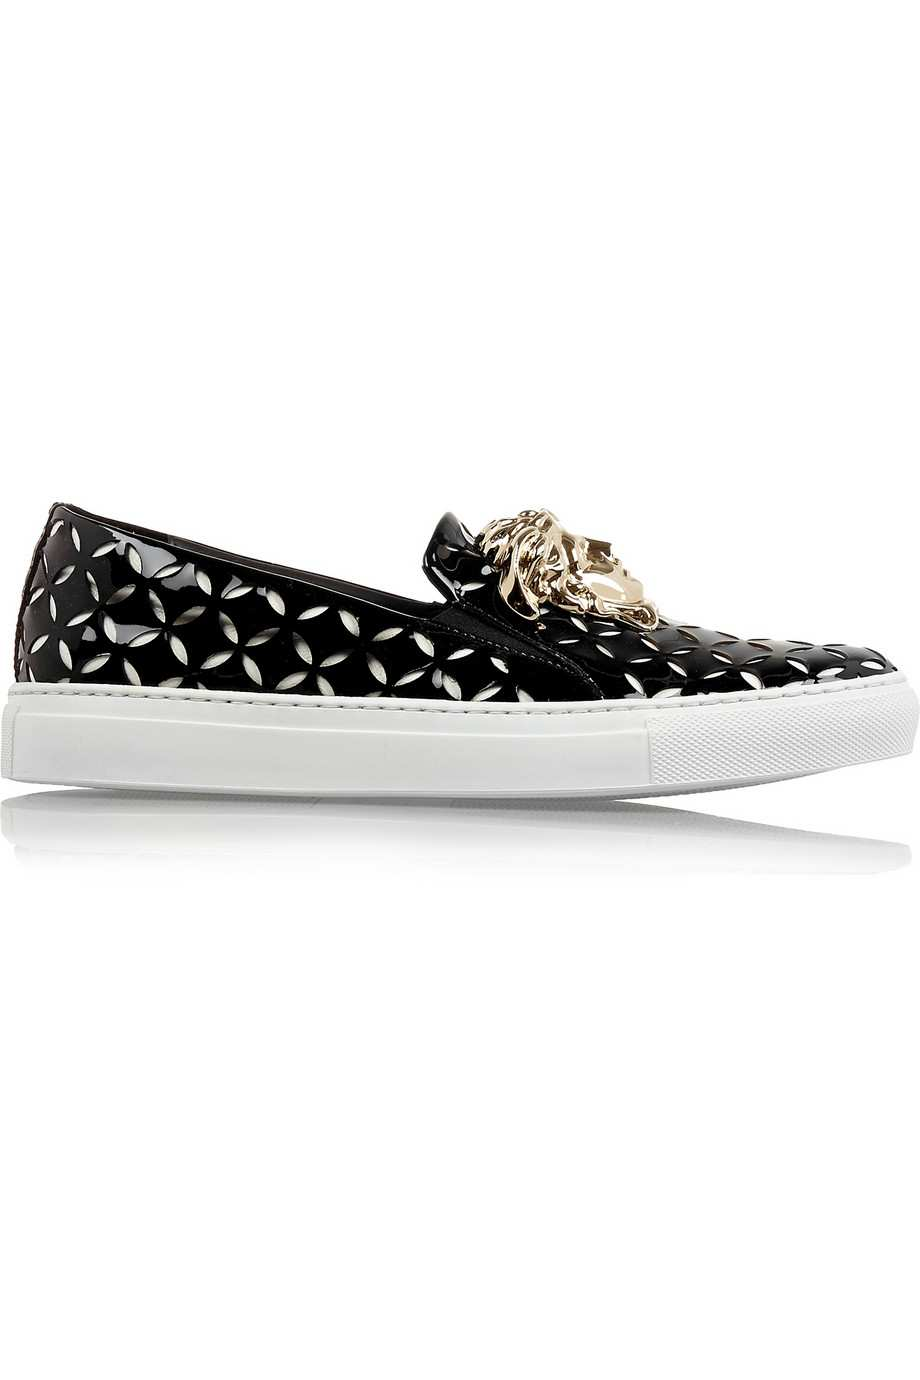 Versace - Slip-on(690 €)